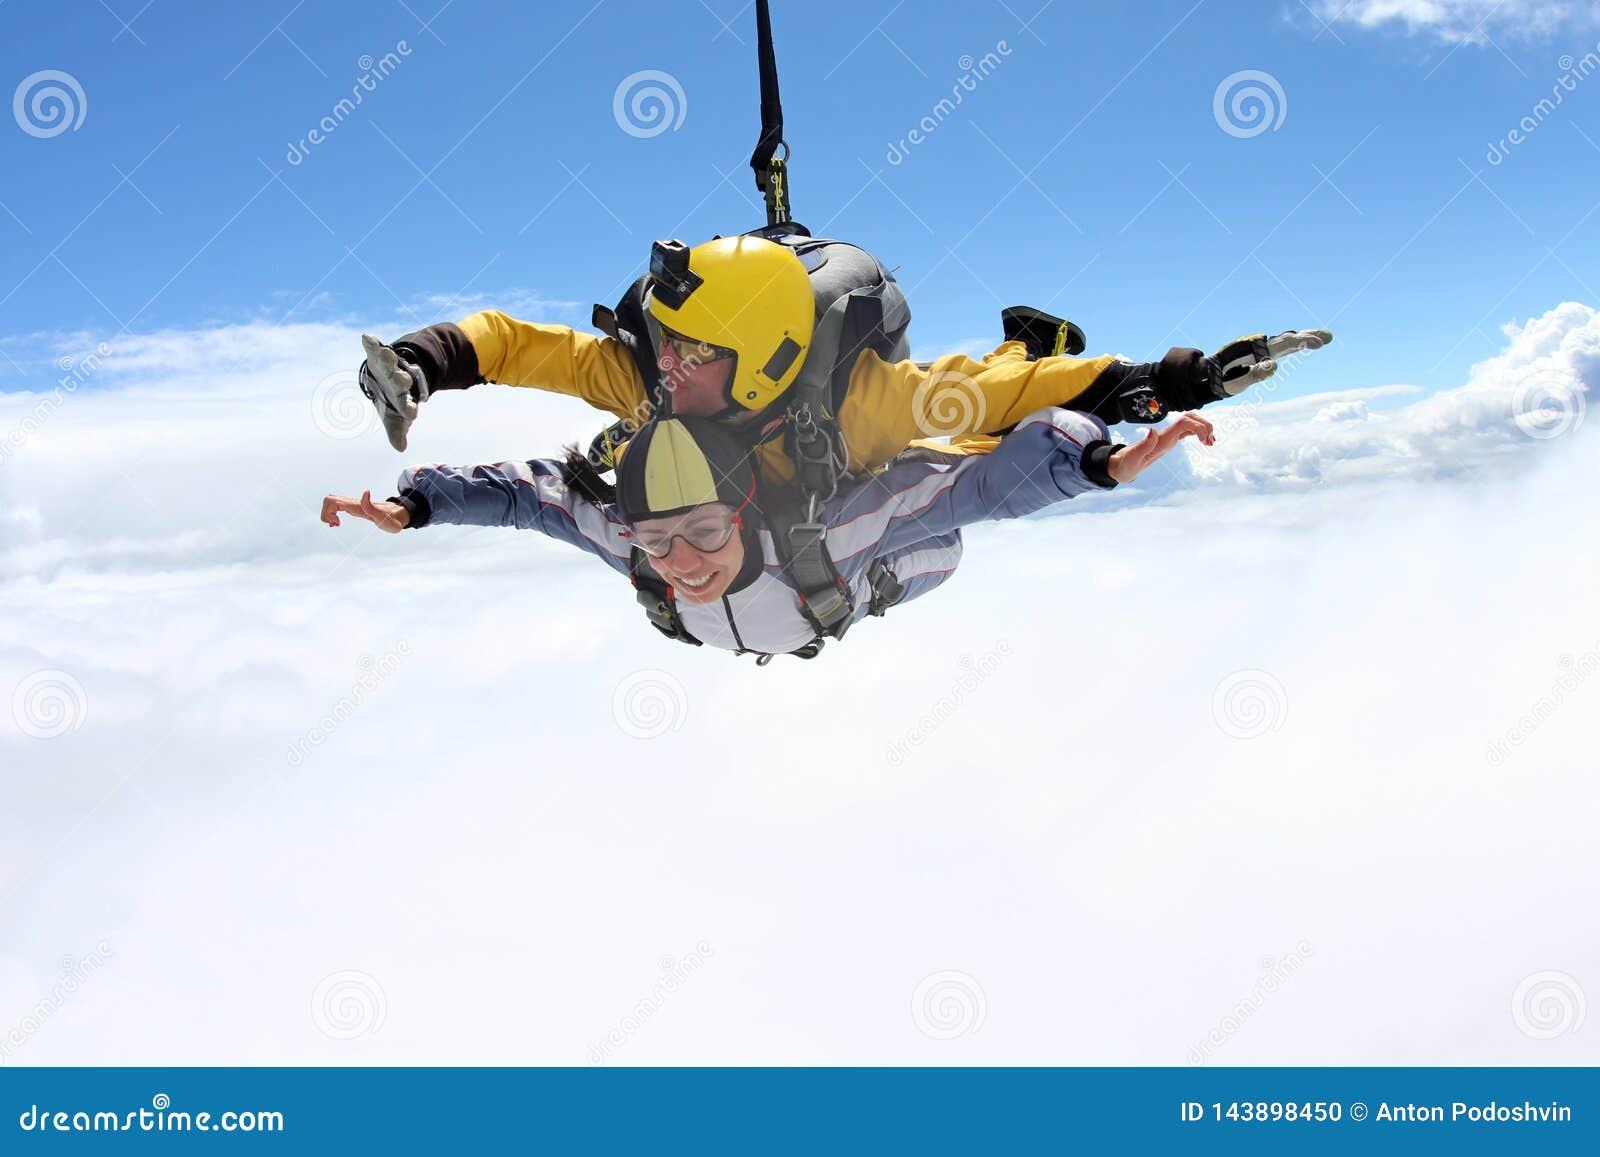 Tandem jump. Skydiving in the blue sky.